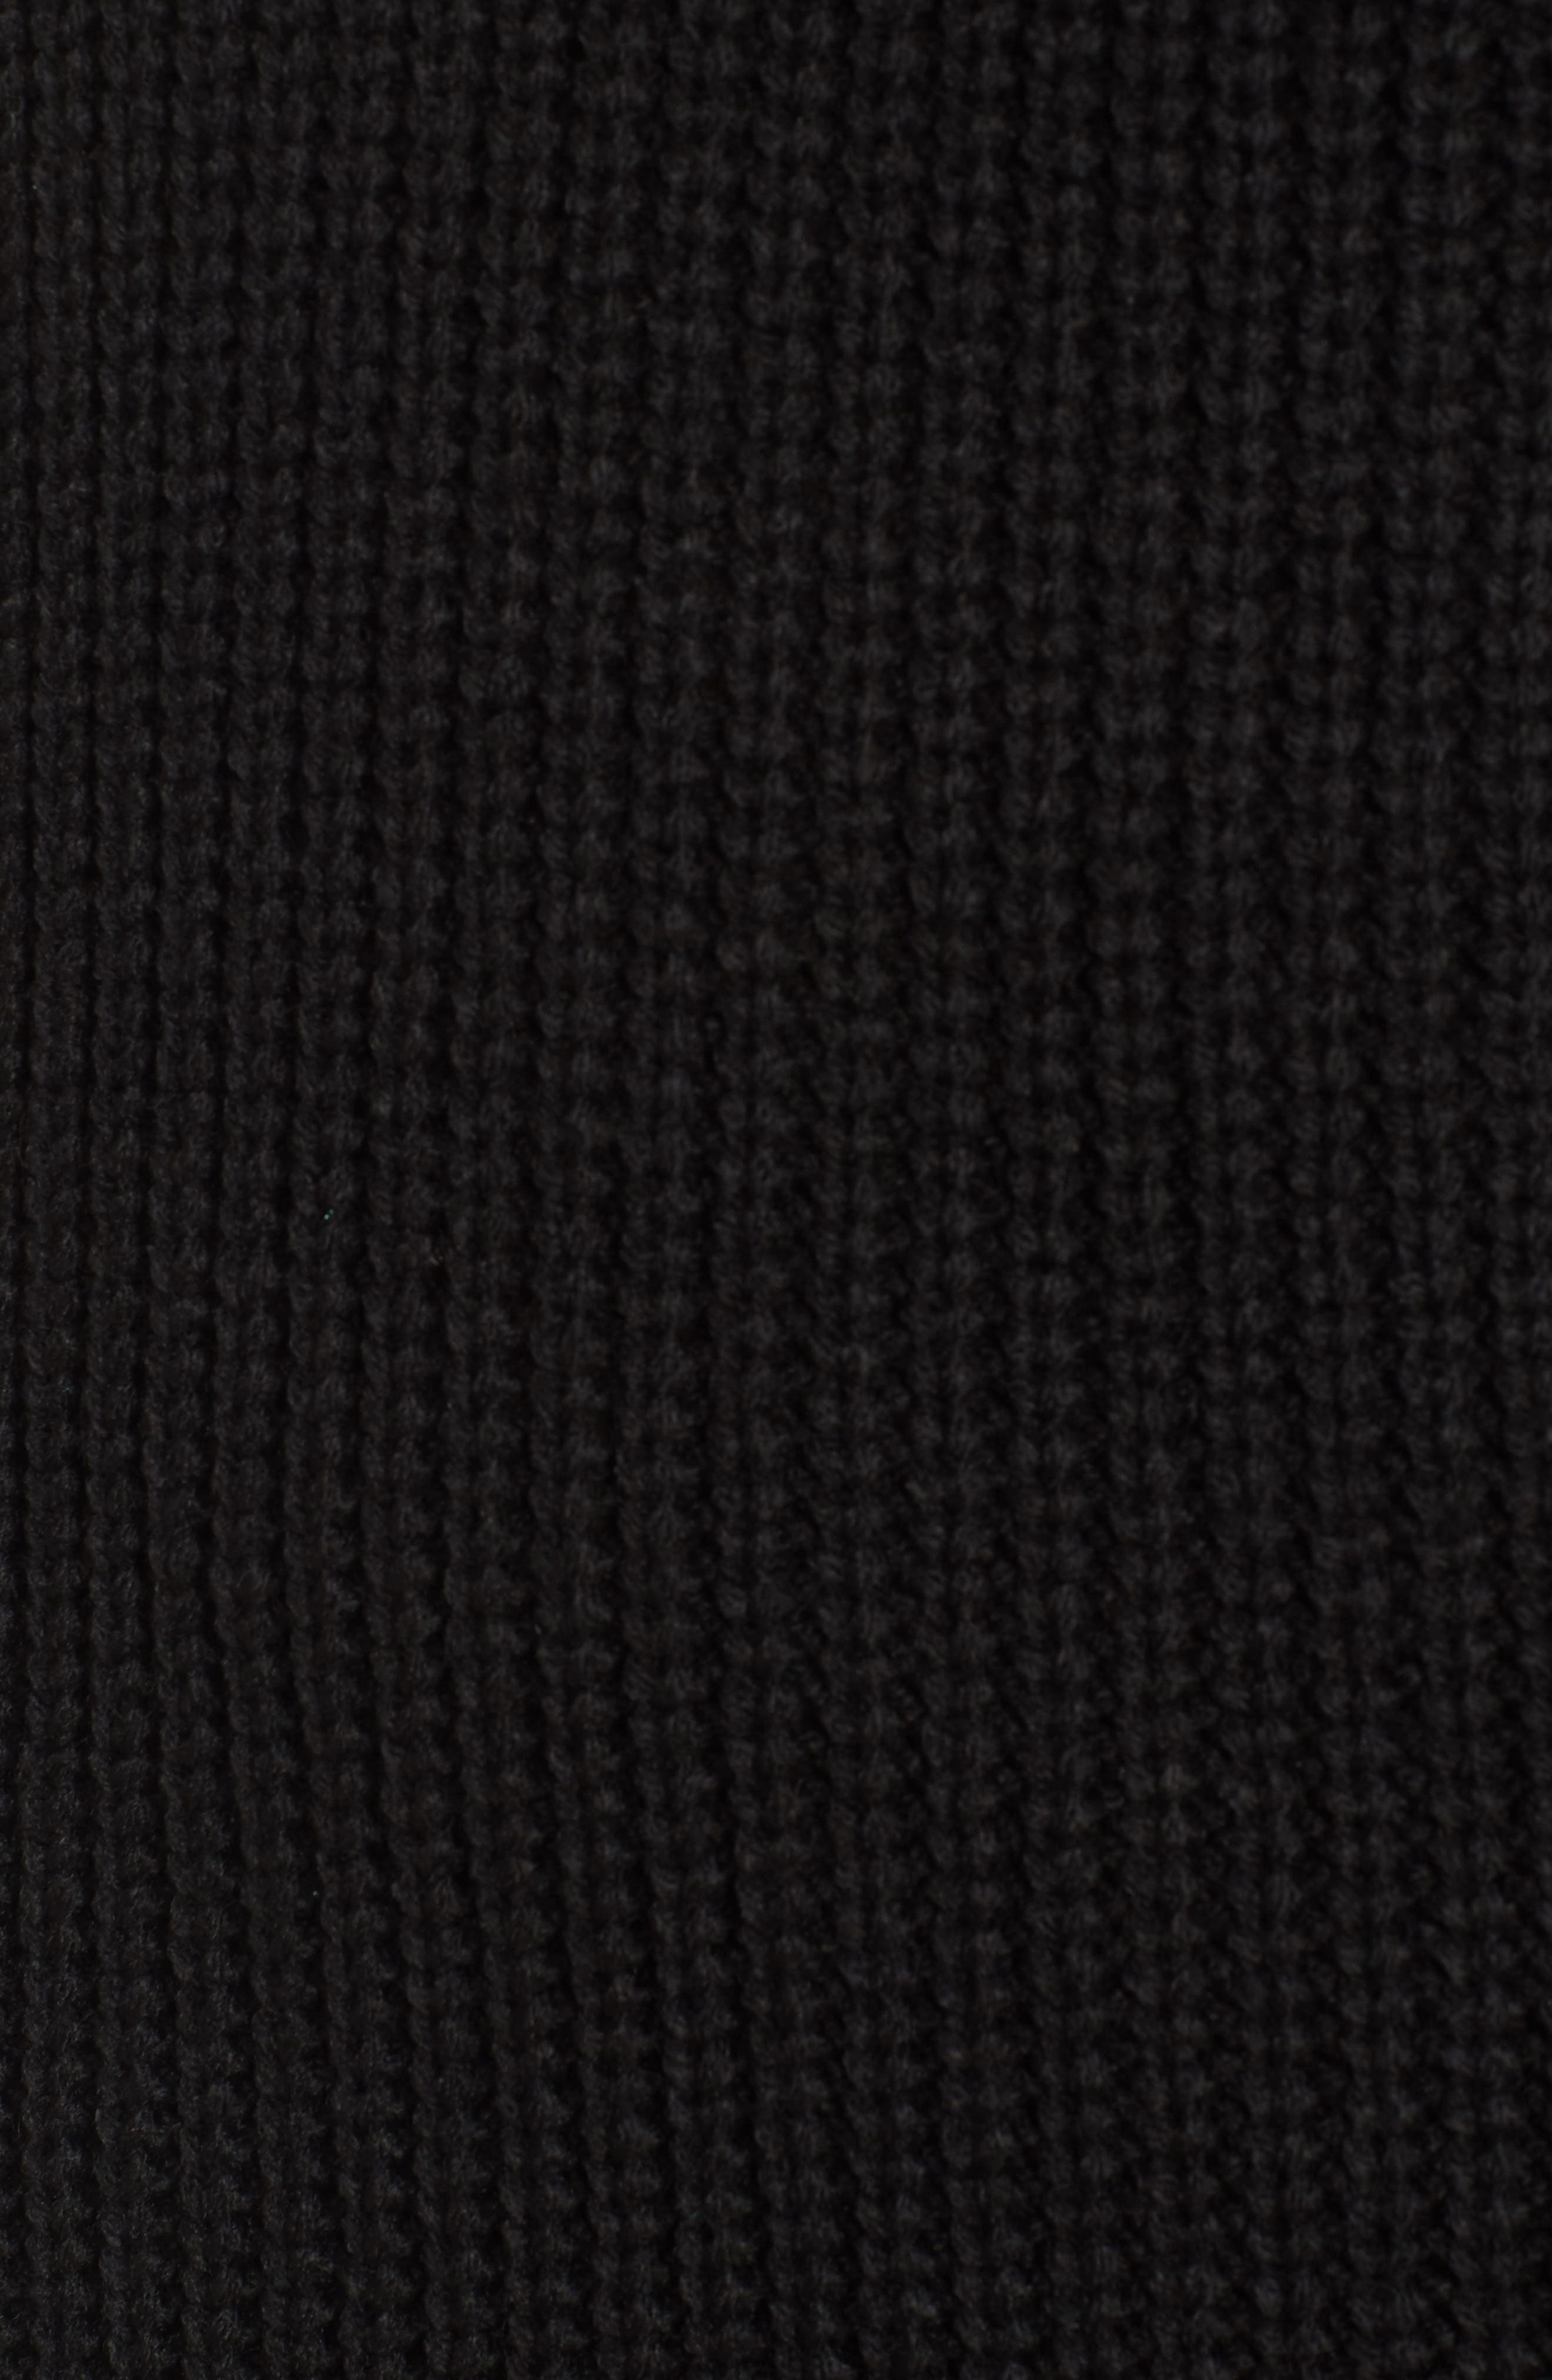 Foldover Off the Shoulder Sweater Dress,                             Alternate thumbnail 5, color,                             001